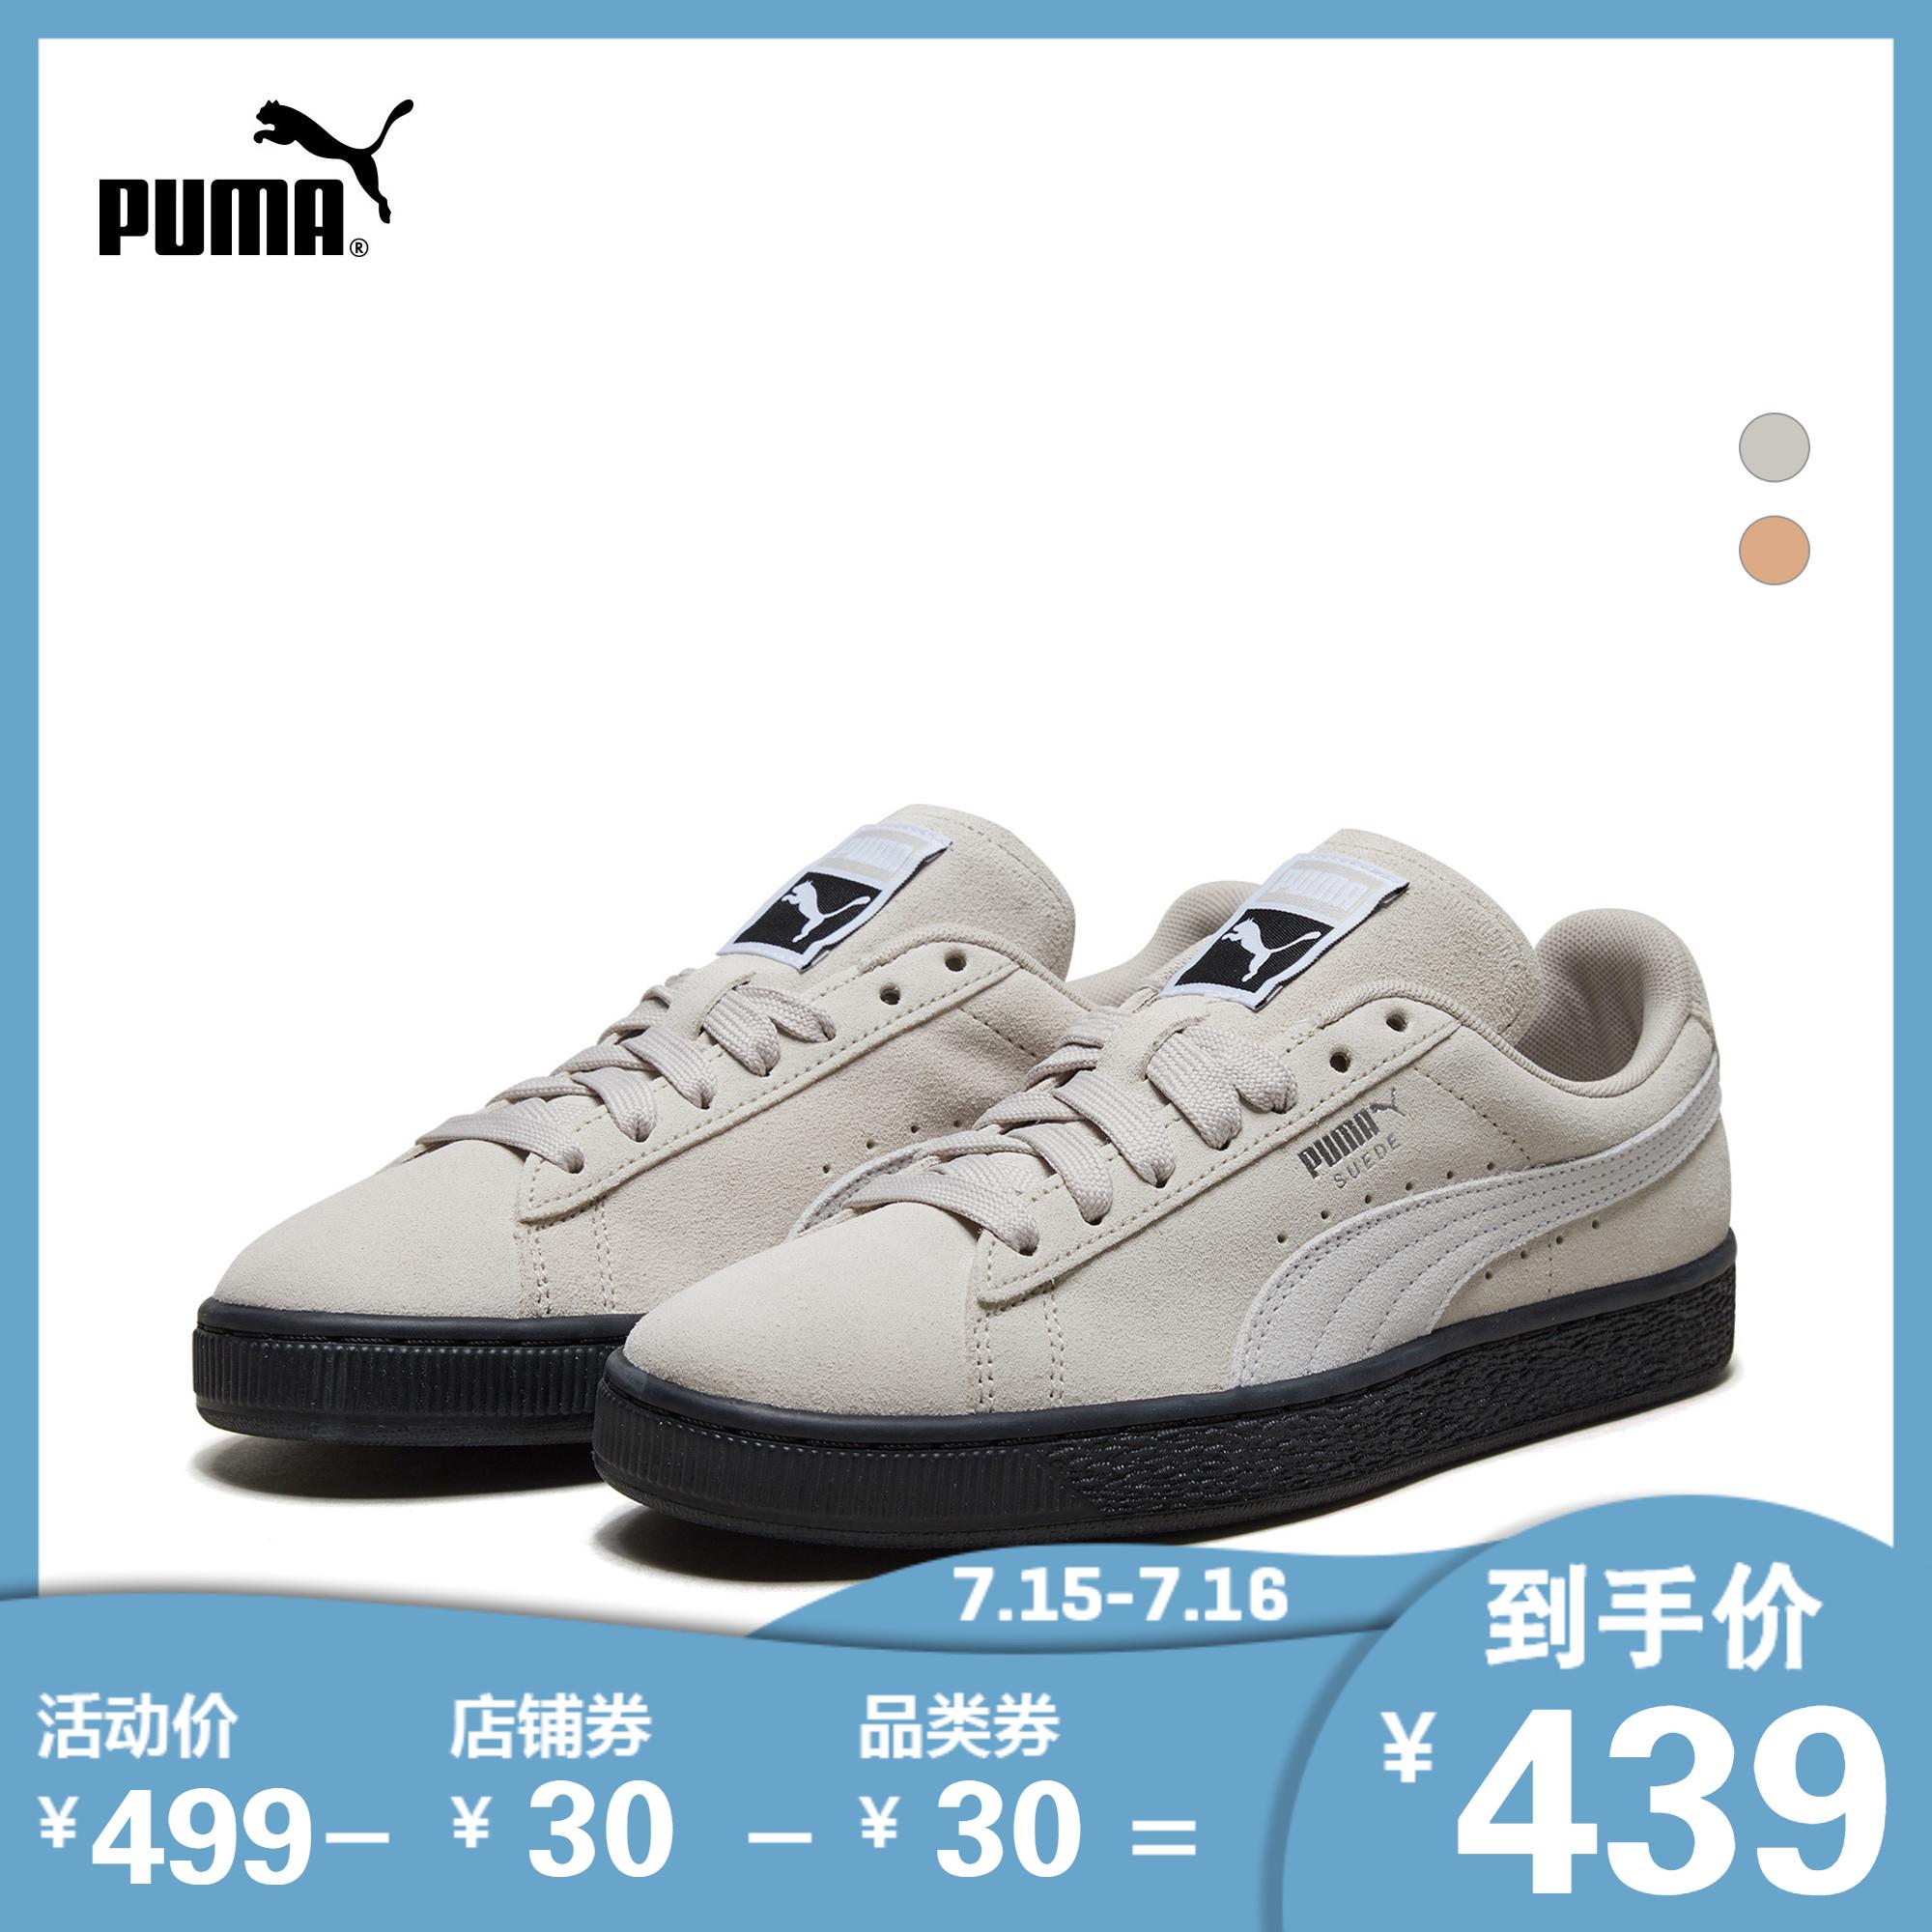 PUMA彪馬官方正品 劉雯同款女子低幫復古經典休閒鞋SUEDE 355462